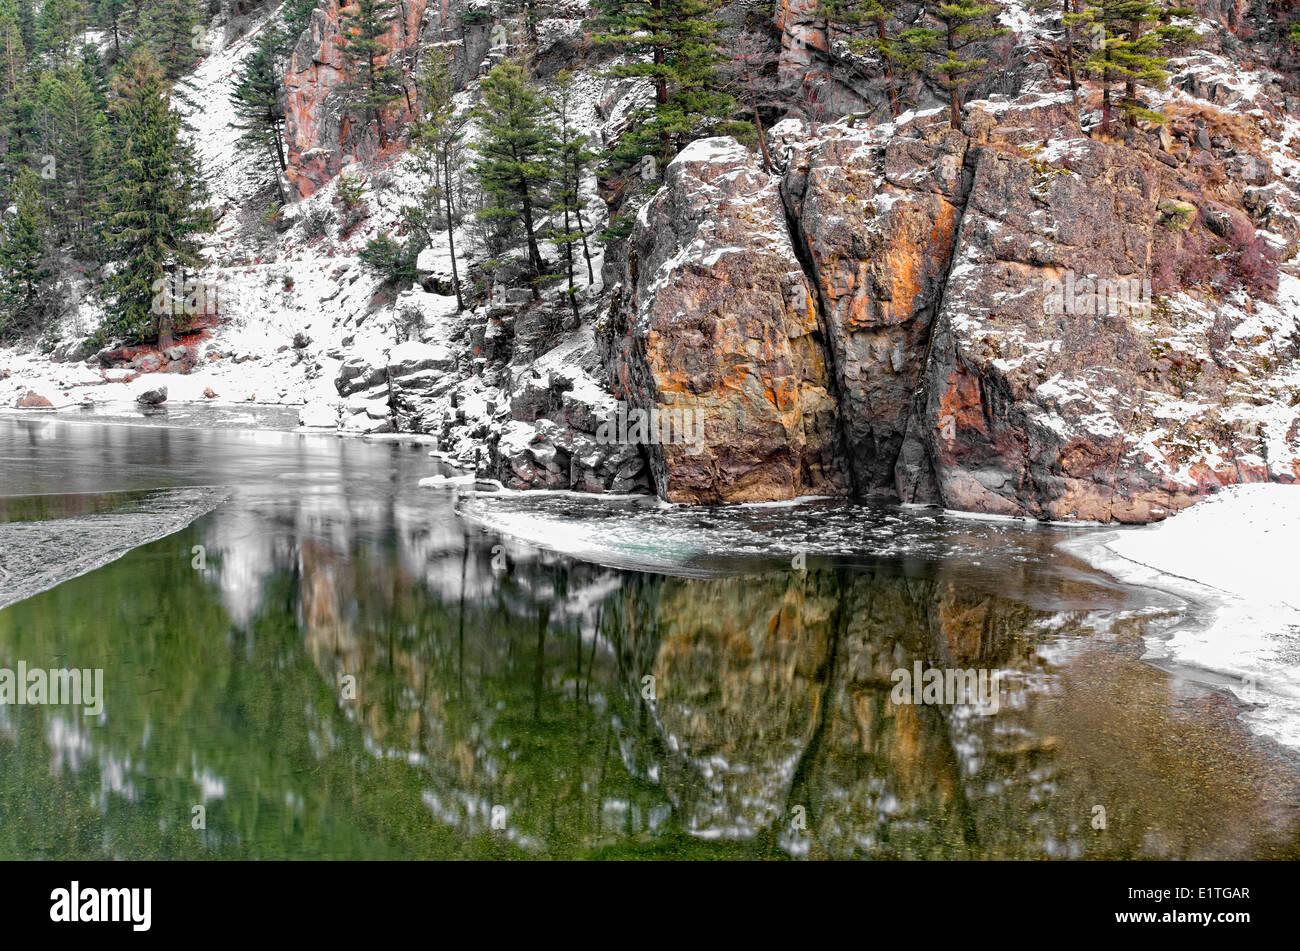 Similkameen River, Bromley Rock Provincial Park, British Columbia, Canada - Stock Image